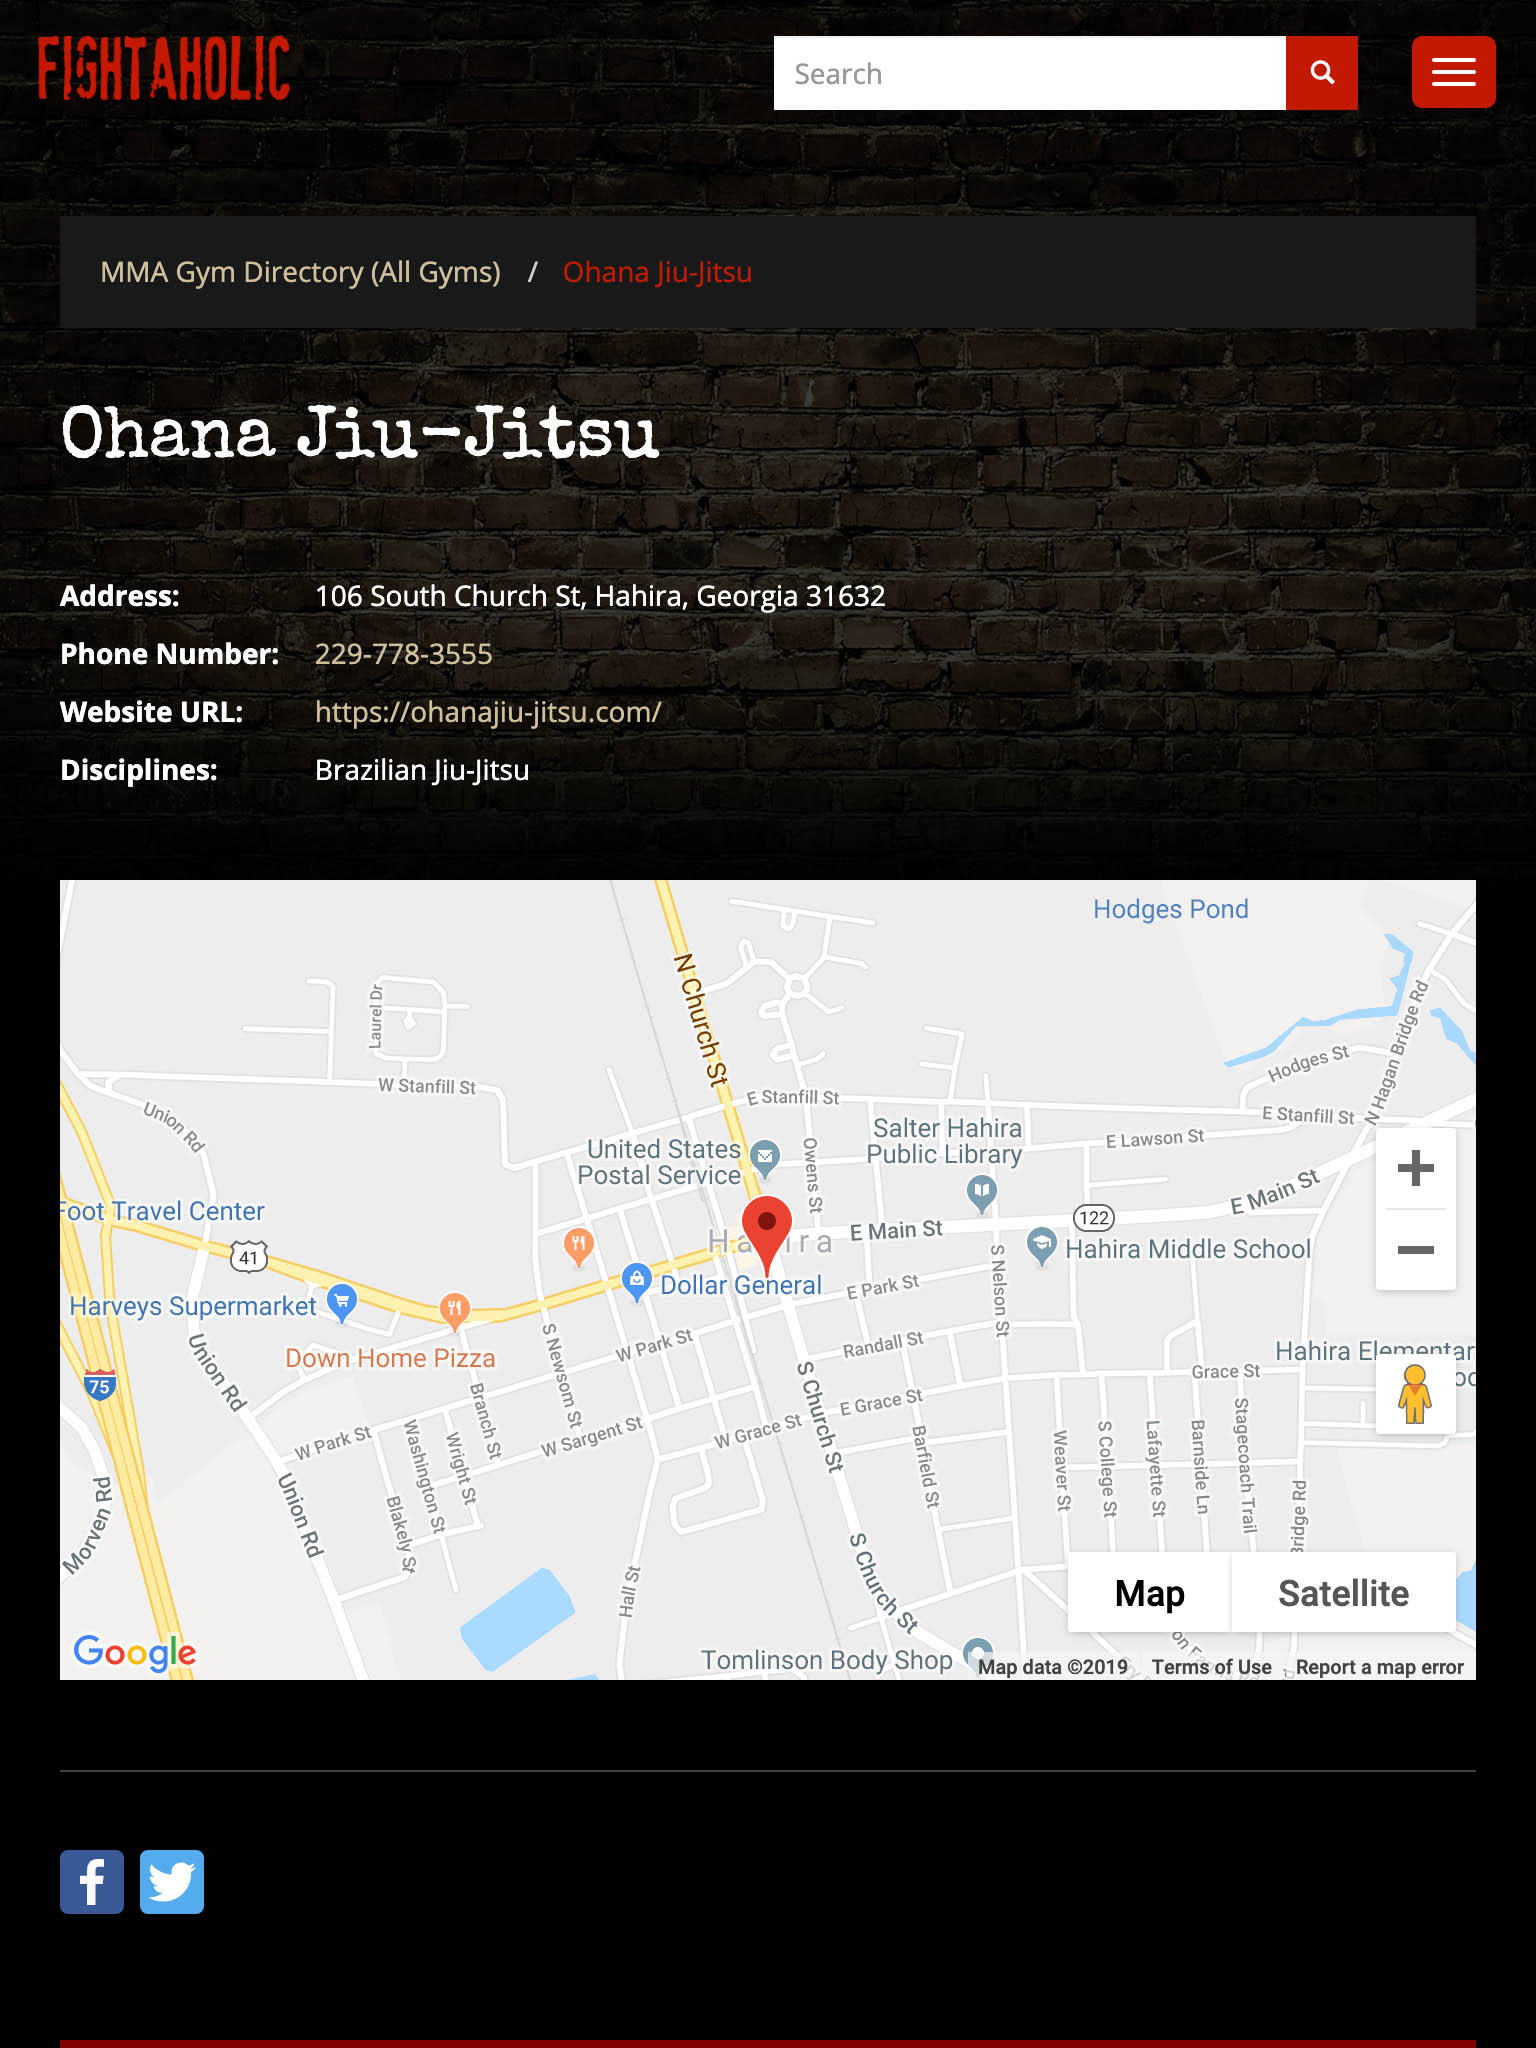 fightaholic-mma-georgia-tablet-web-design-3